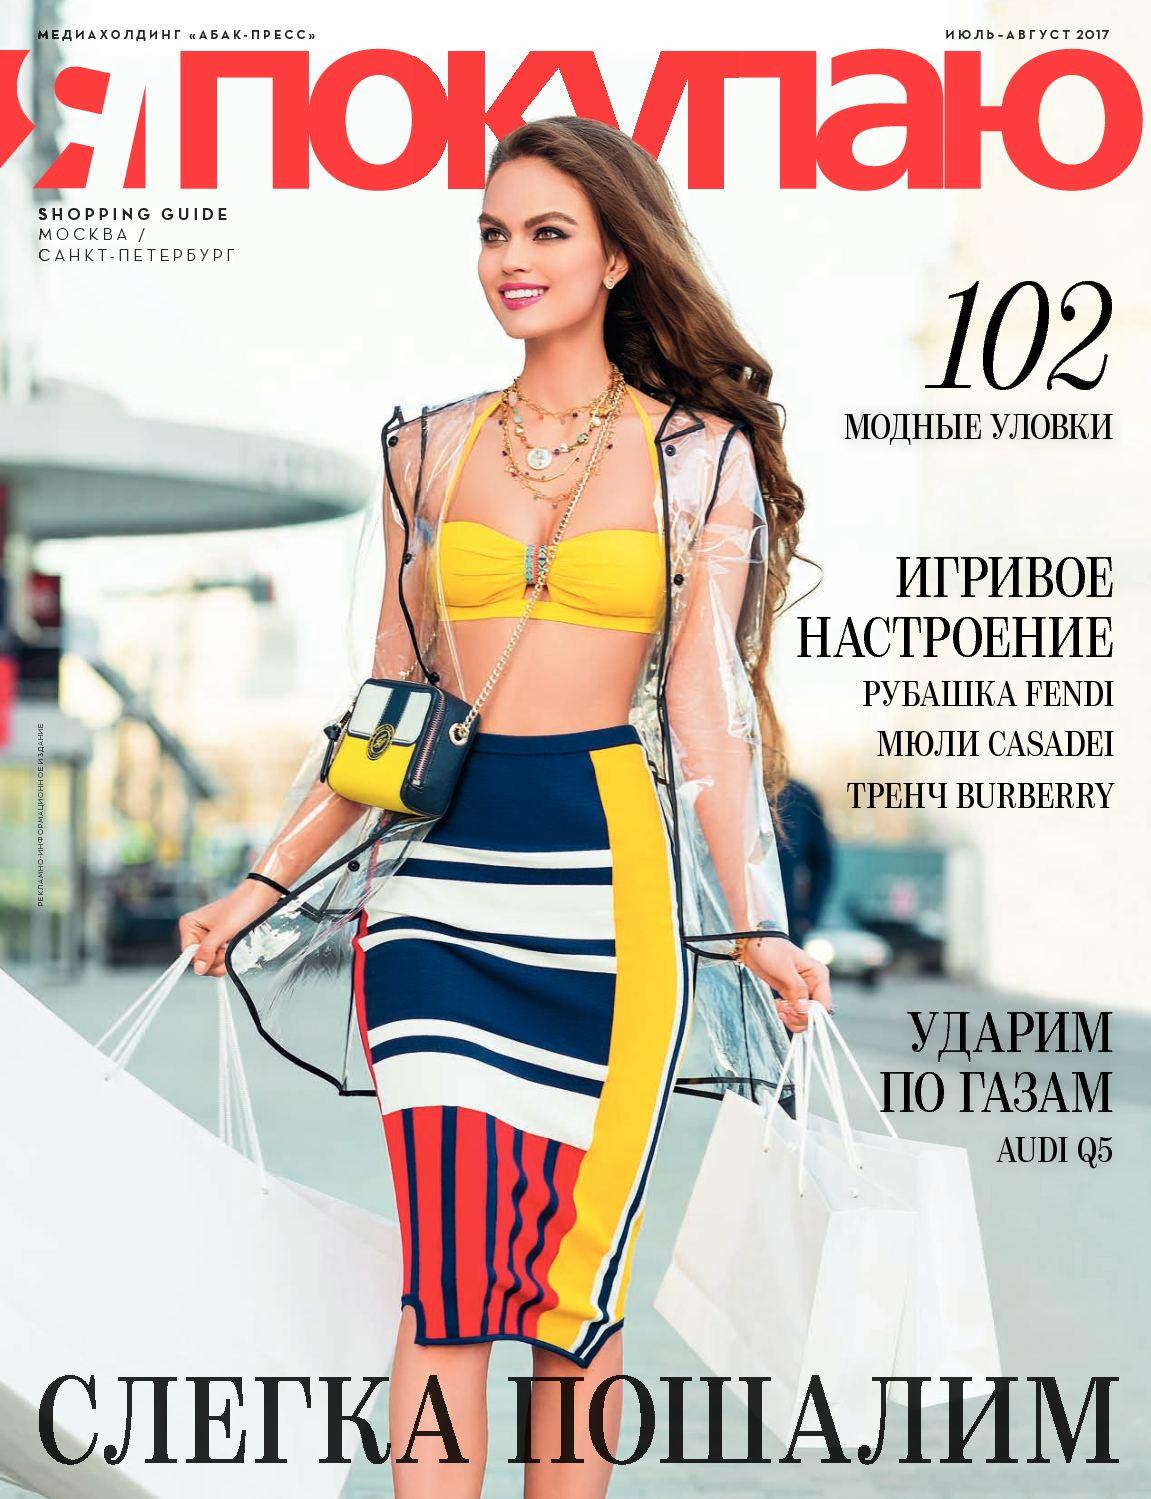 23b3d081876b Calaméo - Shopping Guide «Я Покупаю. Москва - Санкт-Петербург», июль 2017